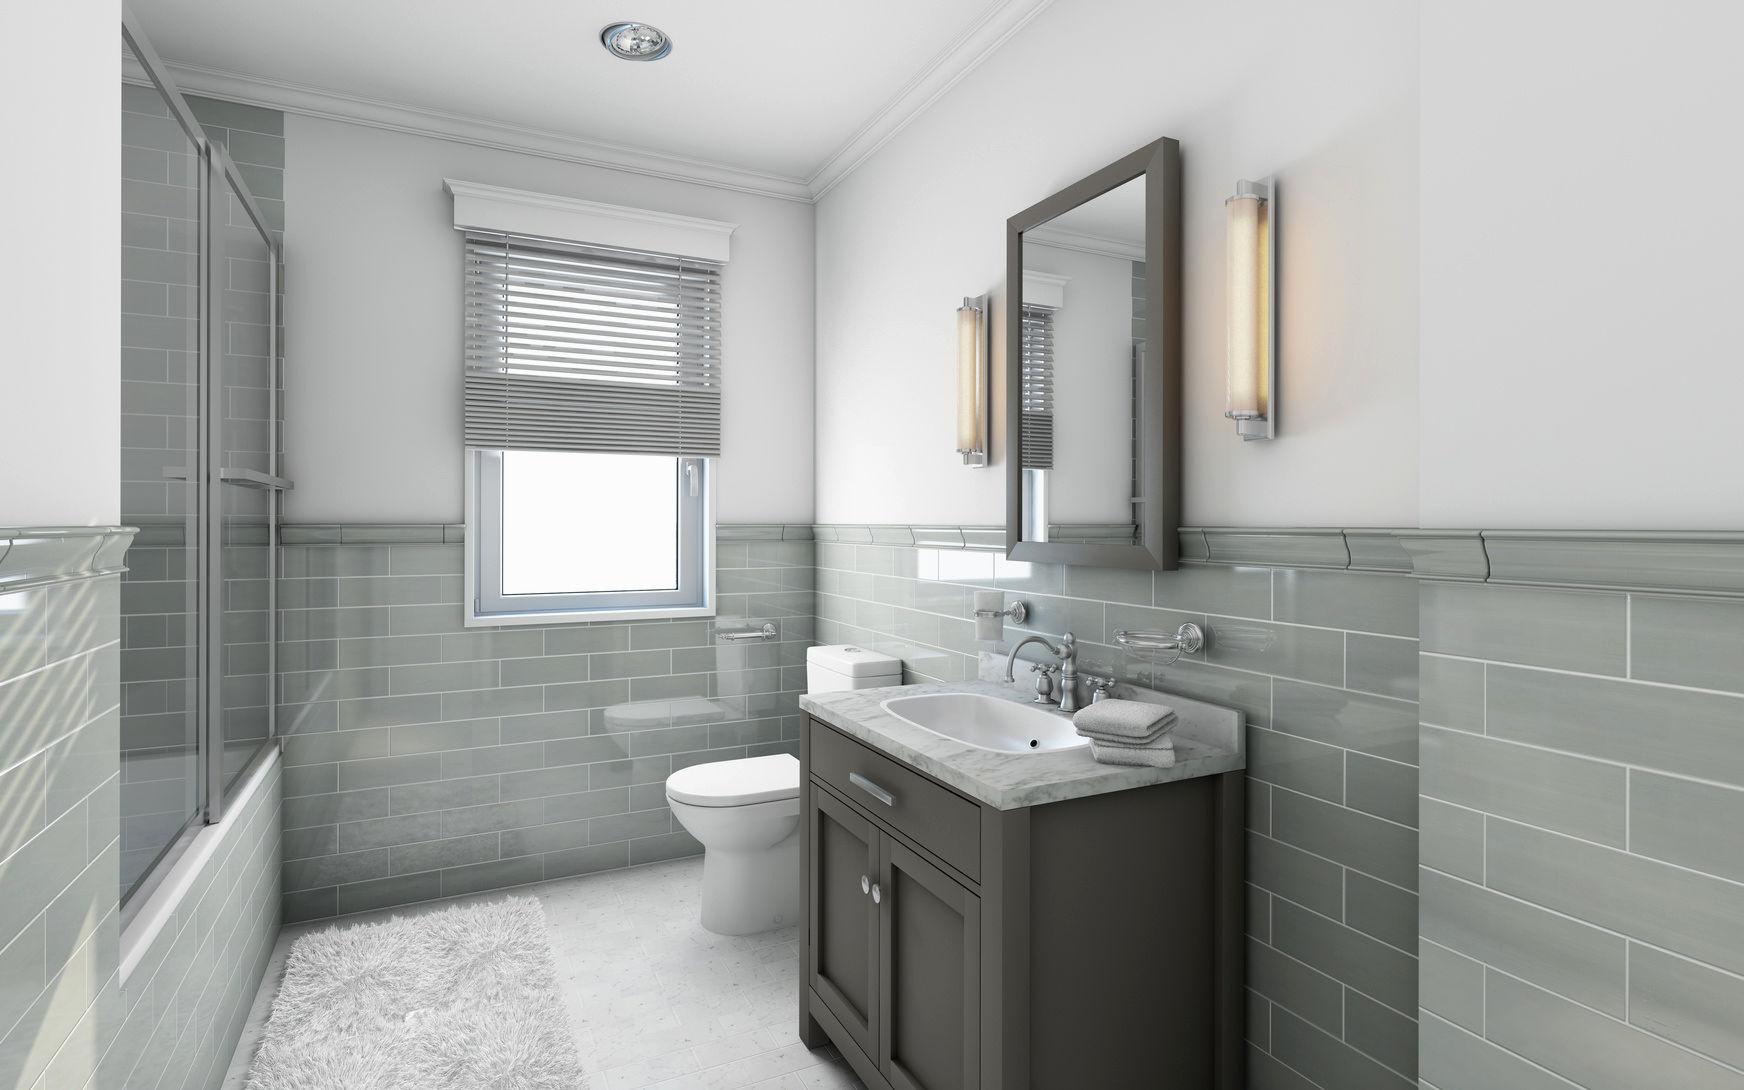 modern bathroom storage ideas layout-Latest Bathroom Storage Ideas Décor